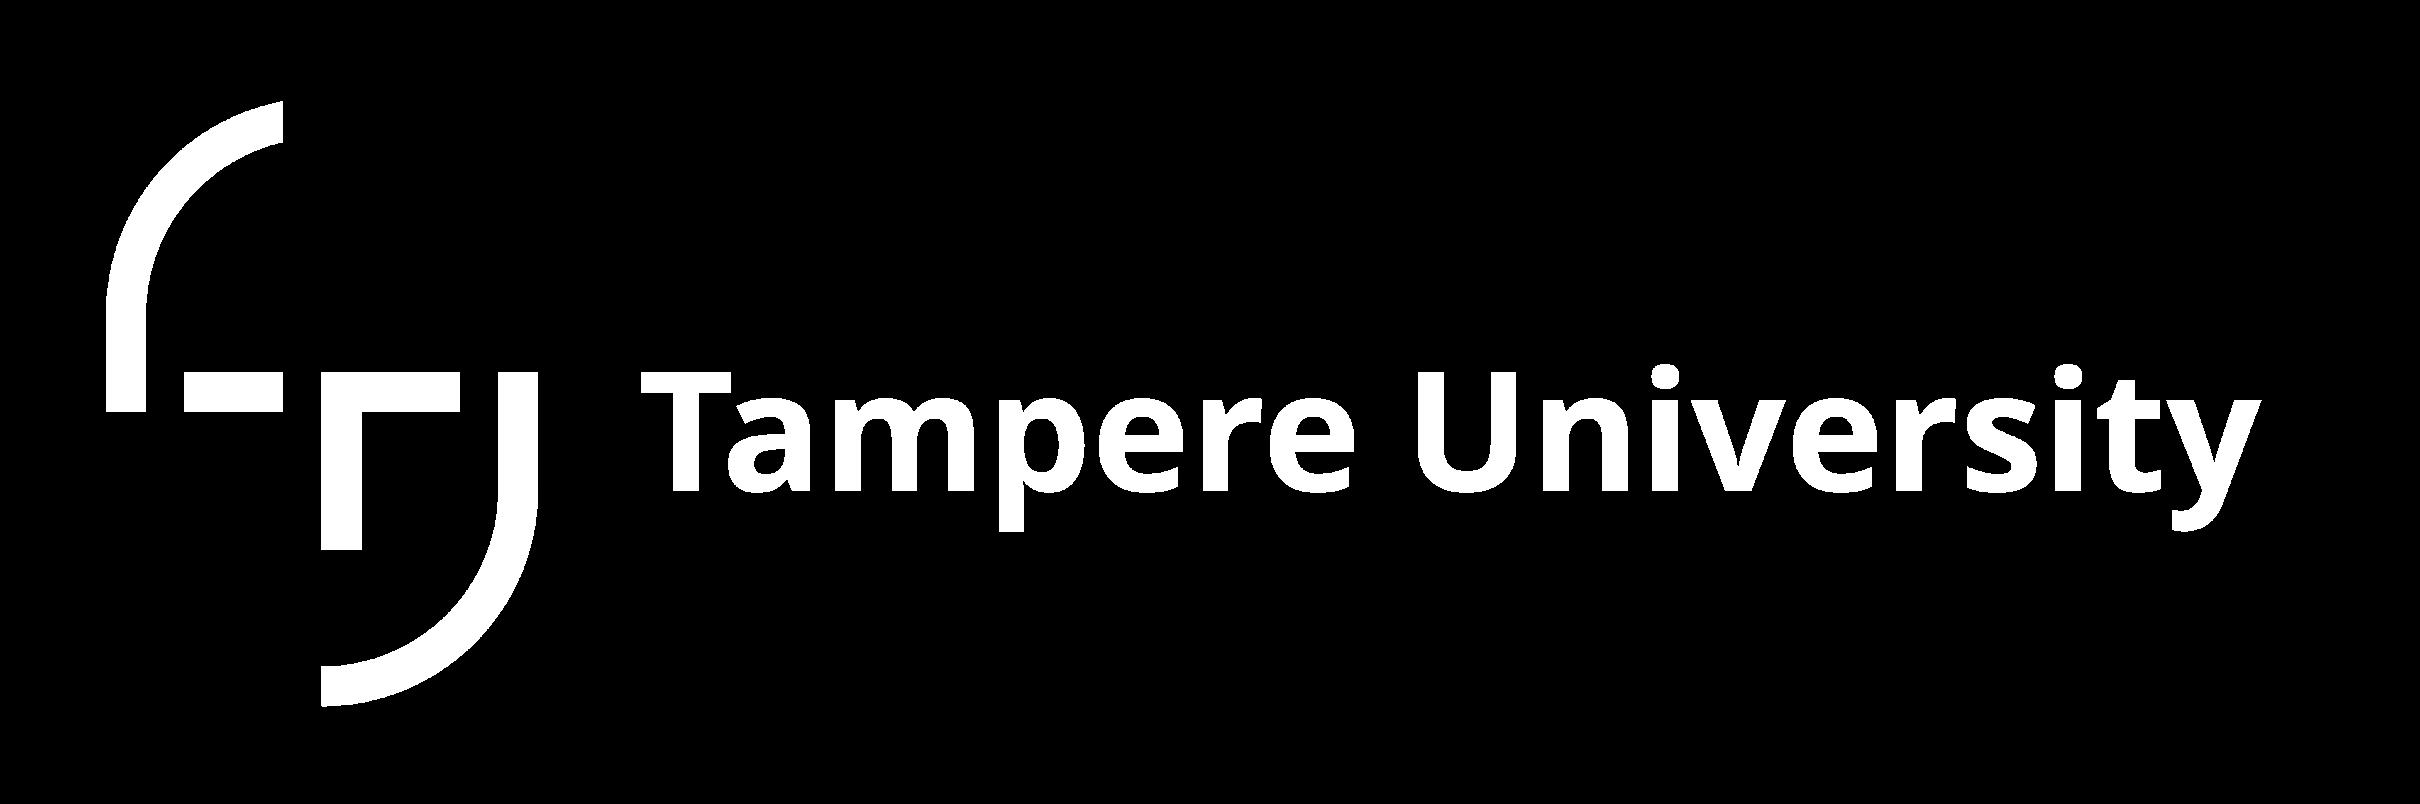 Tampere University logo